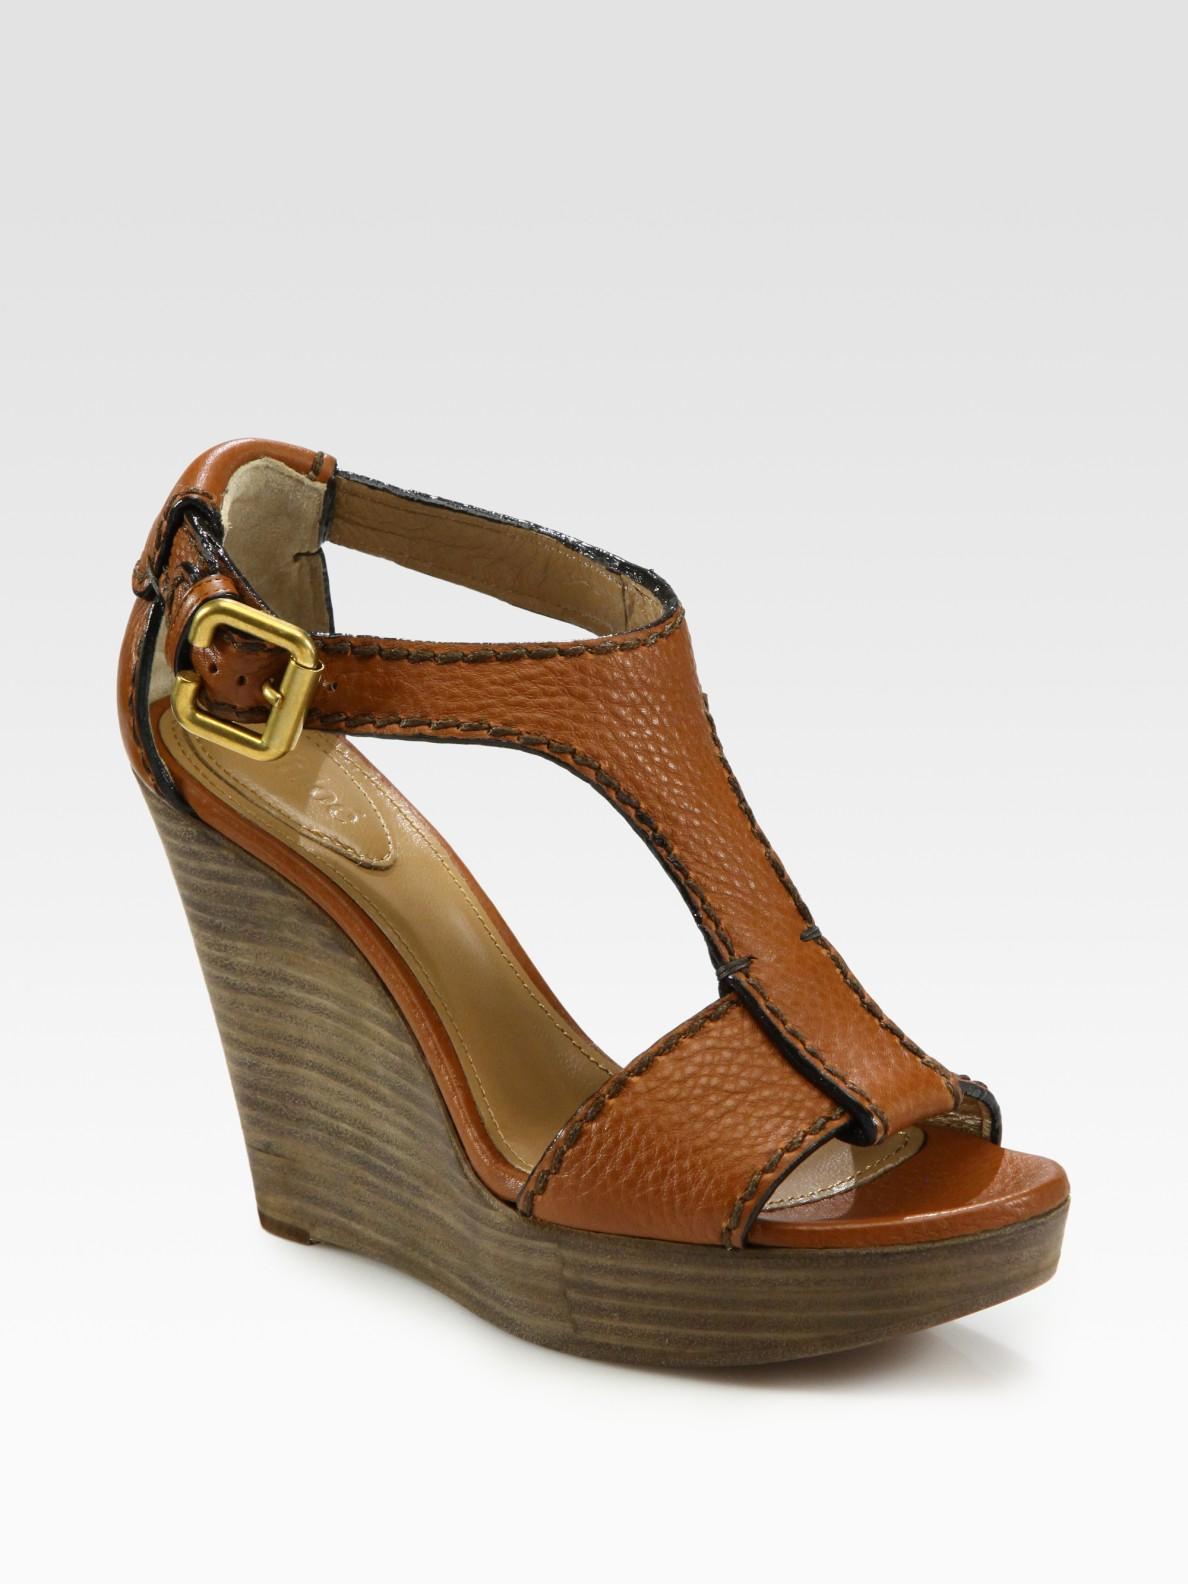 57a53cc27af1 Lyst - Chloé Leather T-strap Platform Wedge Sandals in Brown